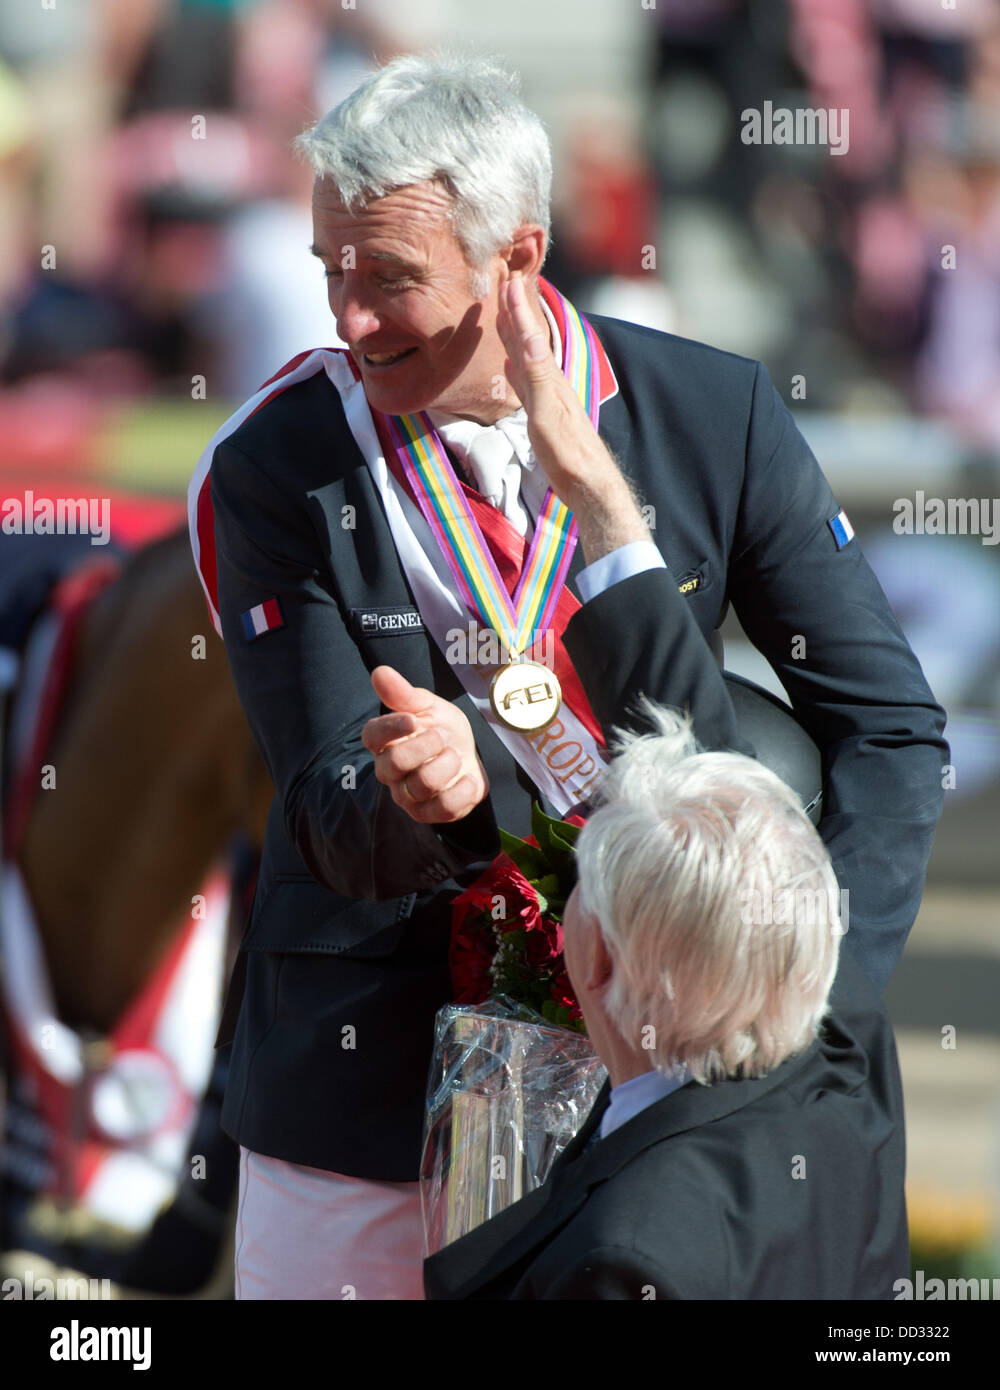 Herning, Denmark. 24th Aug, 2013. Winner French show jumper Roger Yves Bost shakes hands with former German show - Stock Image